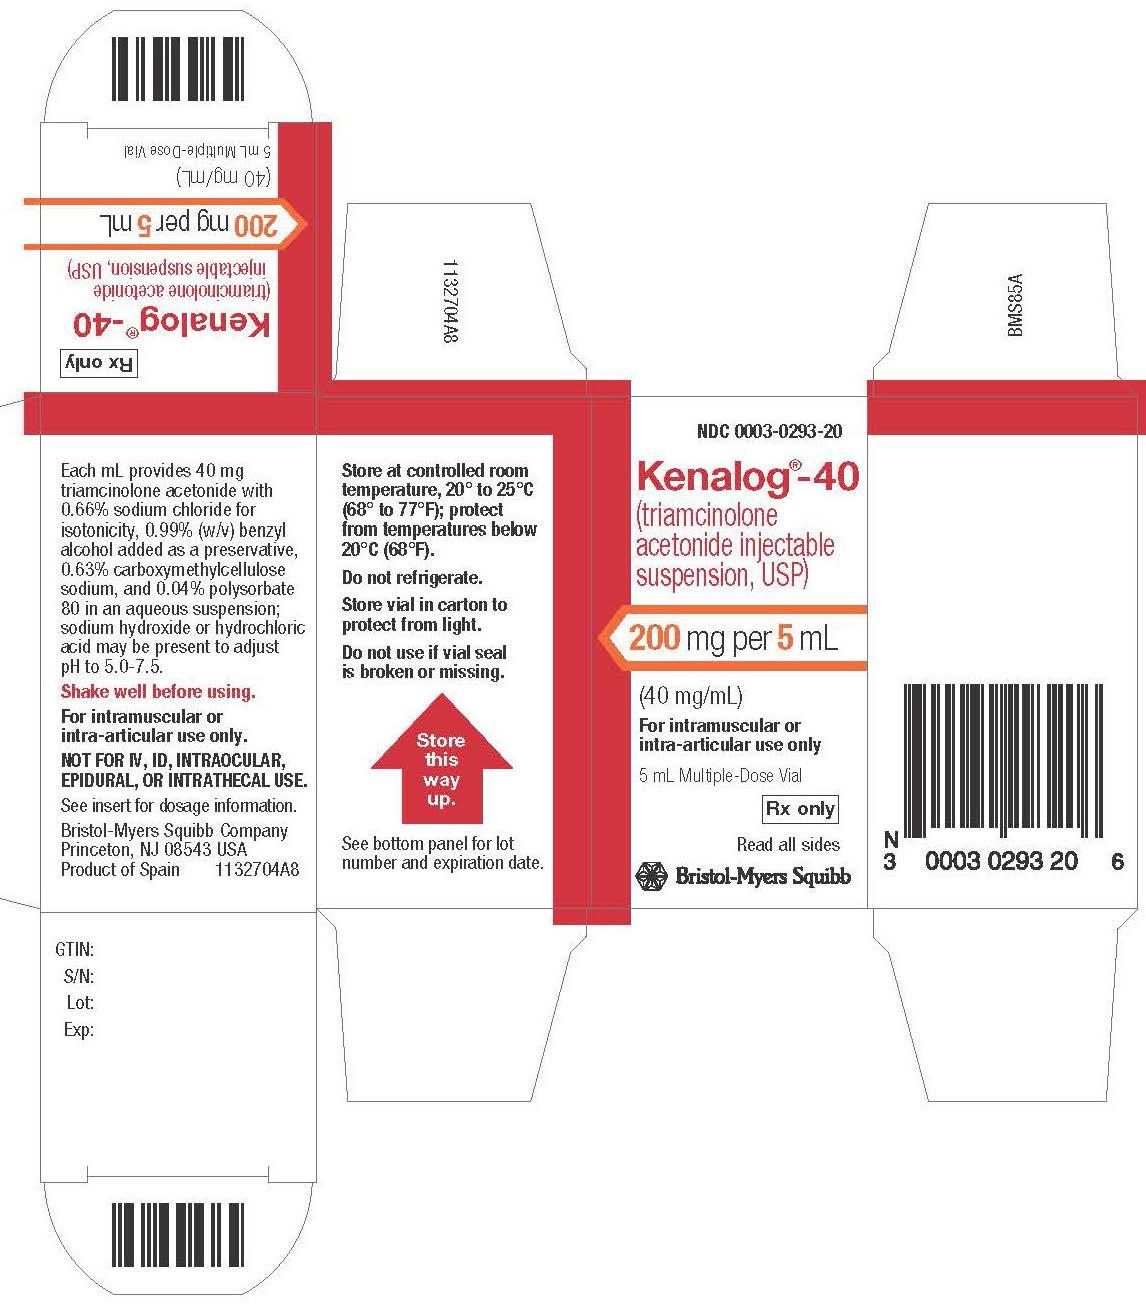 Image Kenalog-40  5 mL vial Label